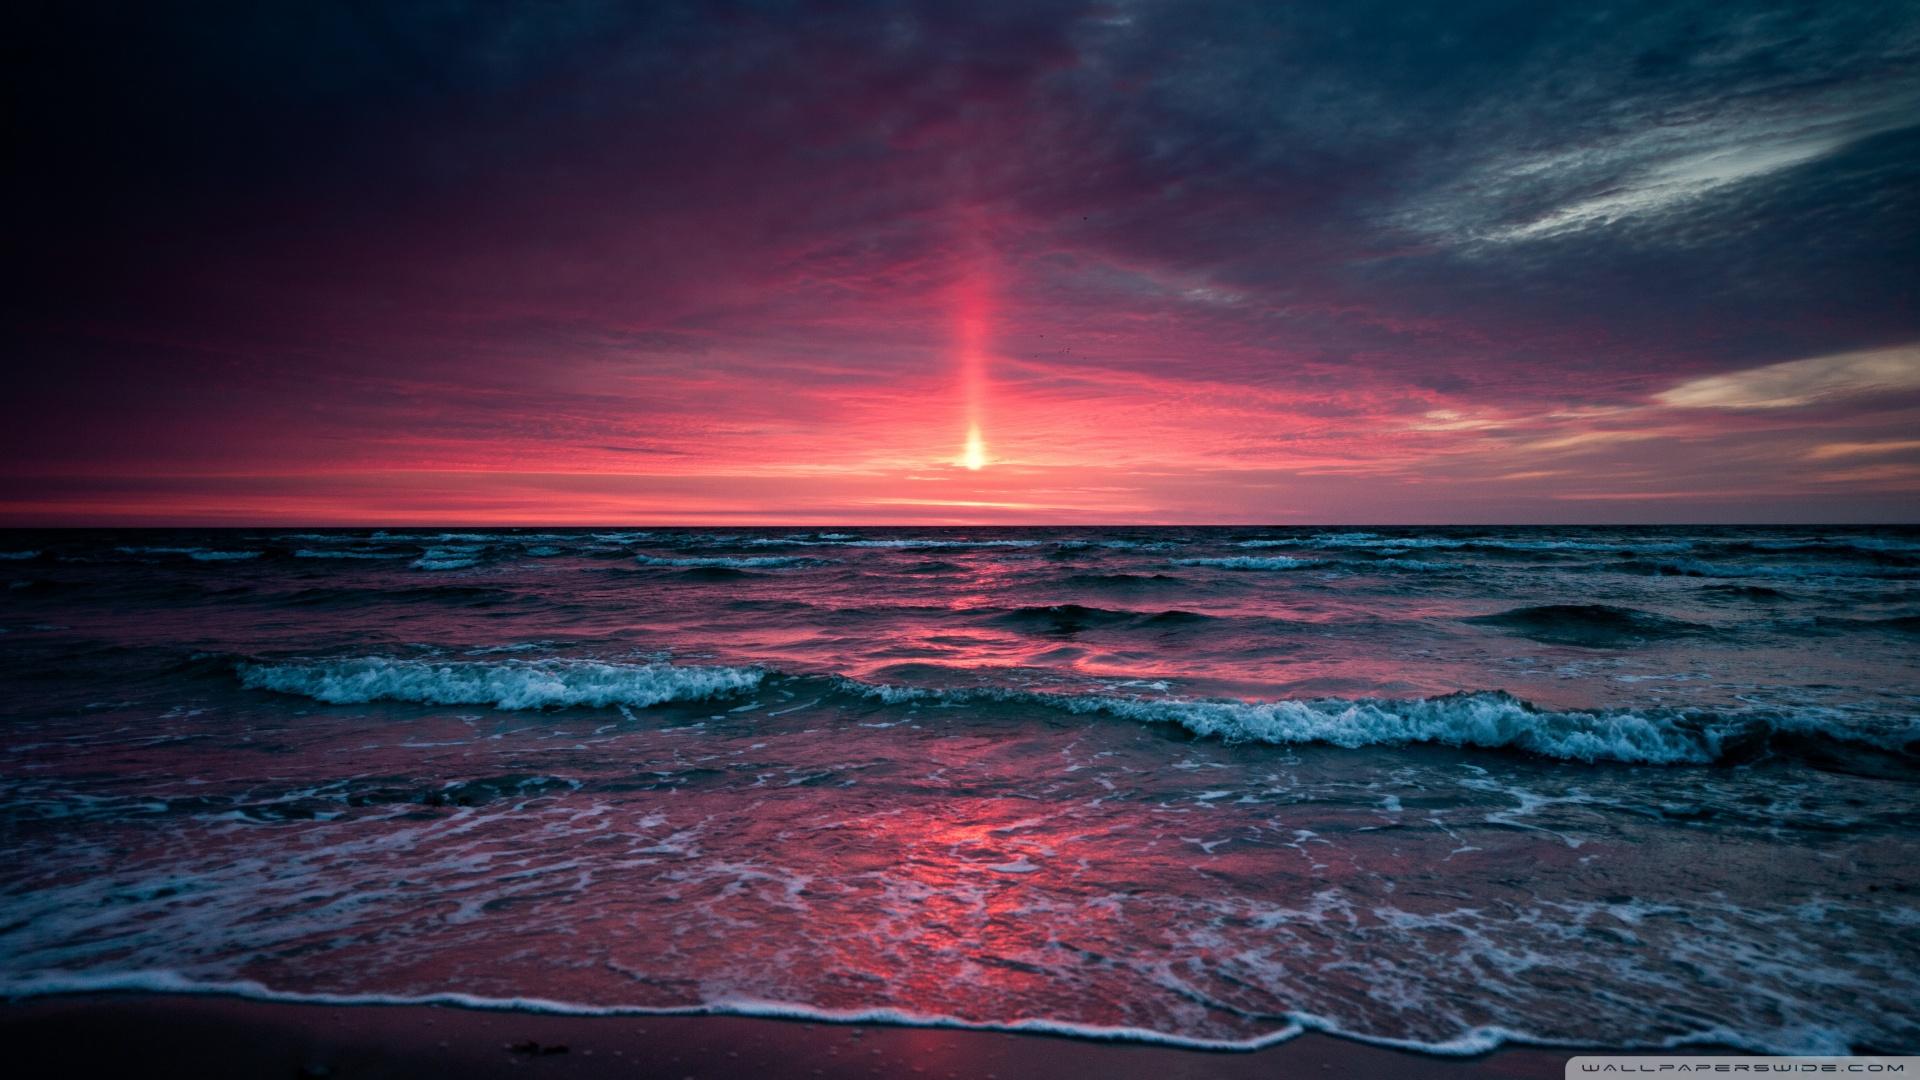 Fond d'écran : le coucher du soleil, mer, ciel 1920x1080 - artg - 1198622 - Fond d'écran - WallHere